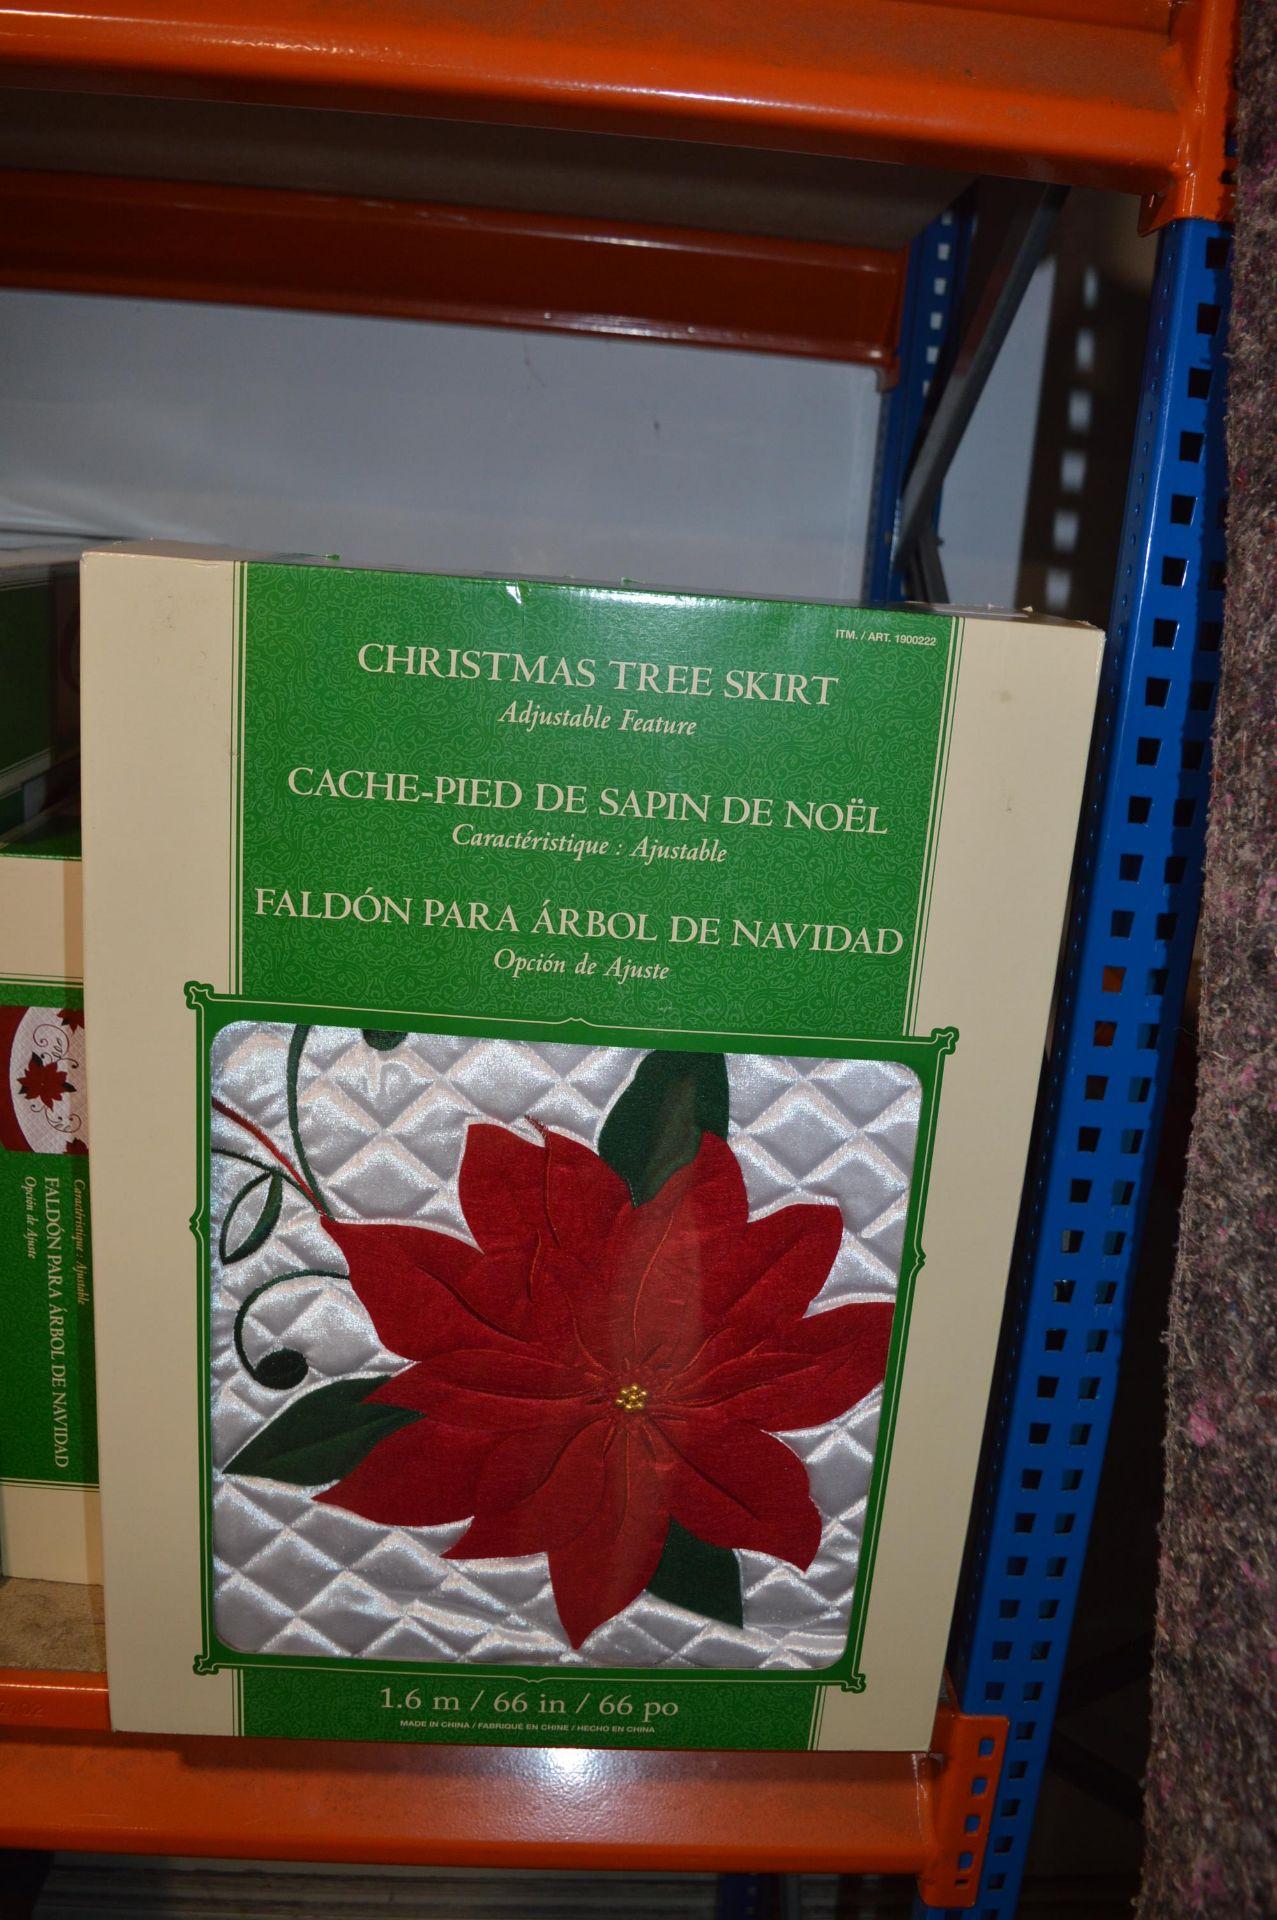 Lot 27 - *Christmas Tree Skirt 1.6m